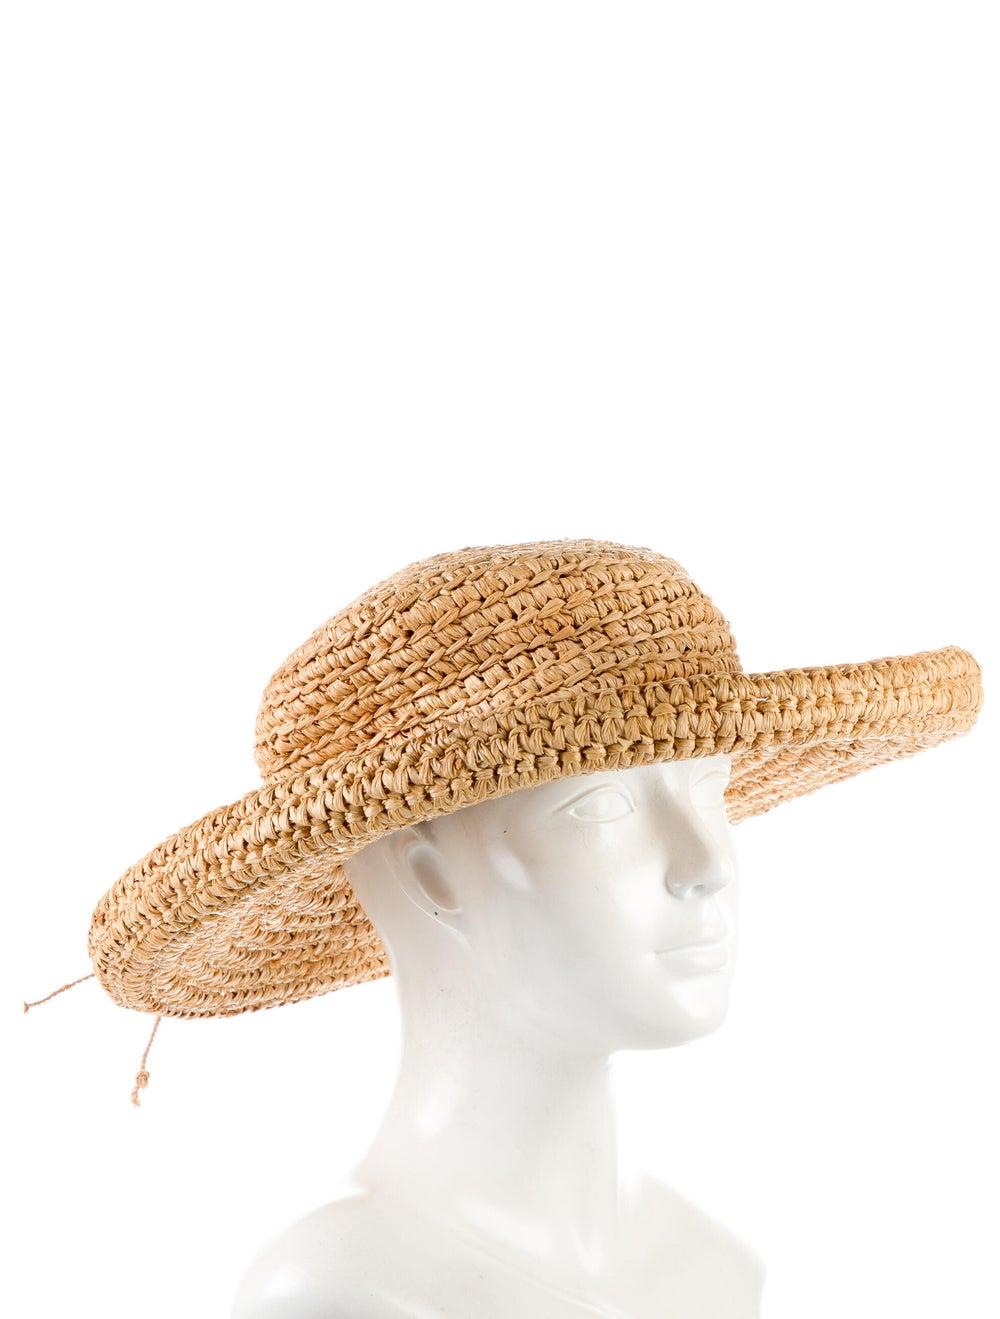 Kaminski Straw Wide Brim Hat Brown - image 3